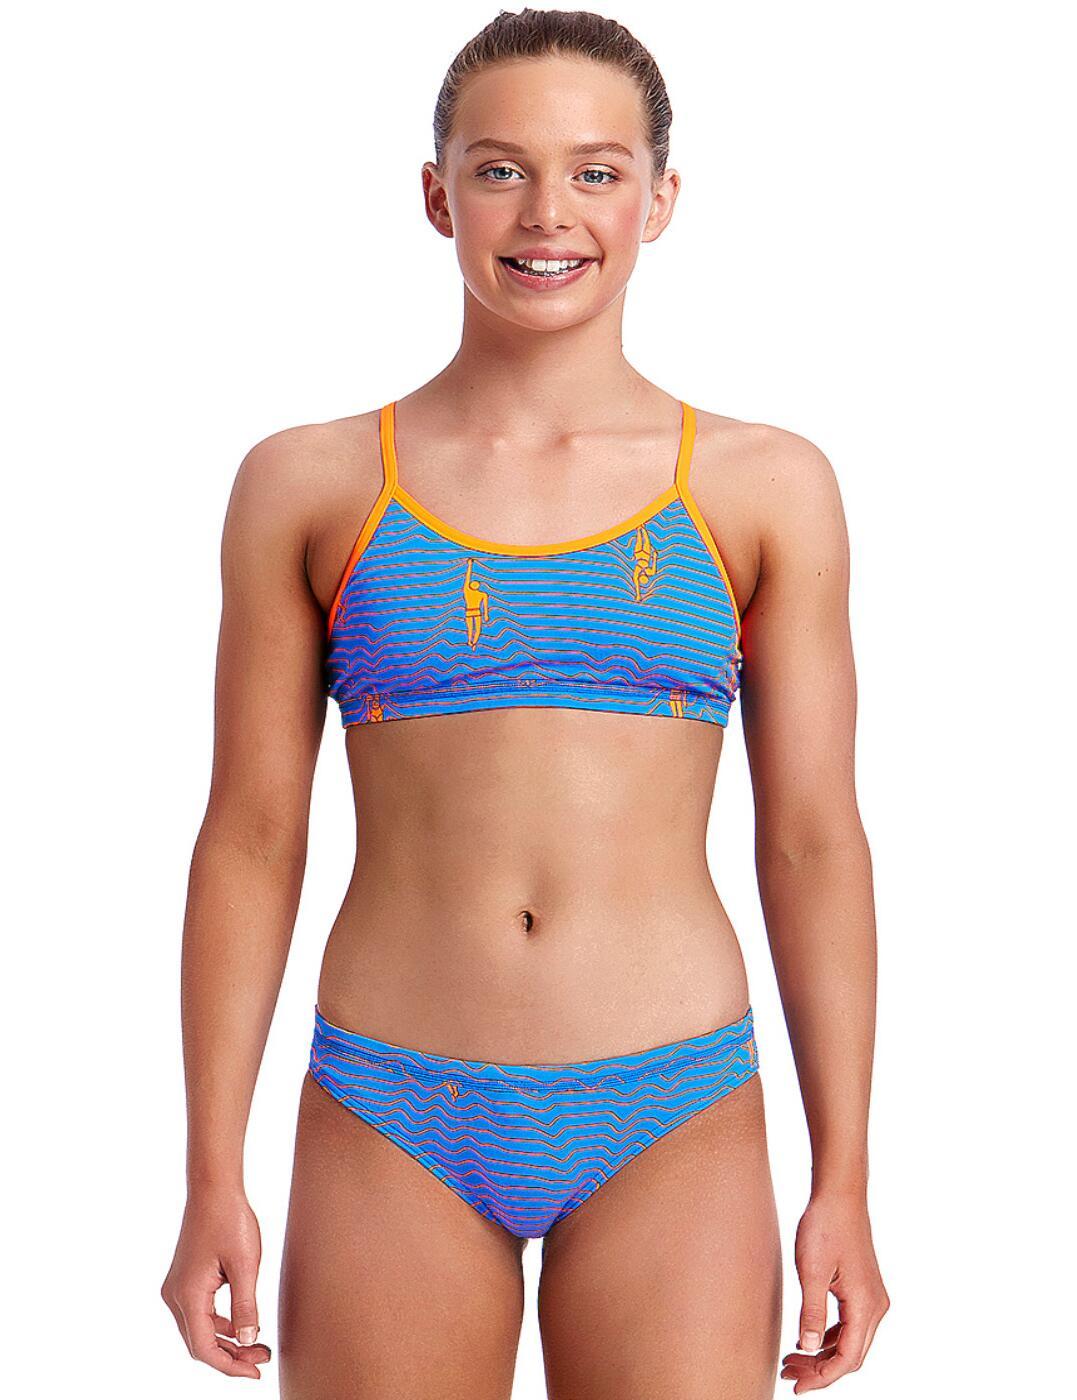 FS02G02000 Funkita Girls Ocean Swim Racerback Two Piece Bikini Set - FS02G02000 Ocean Swim